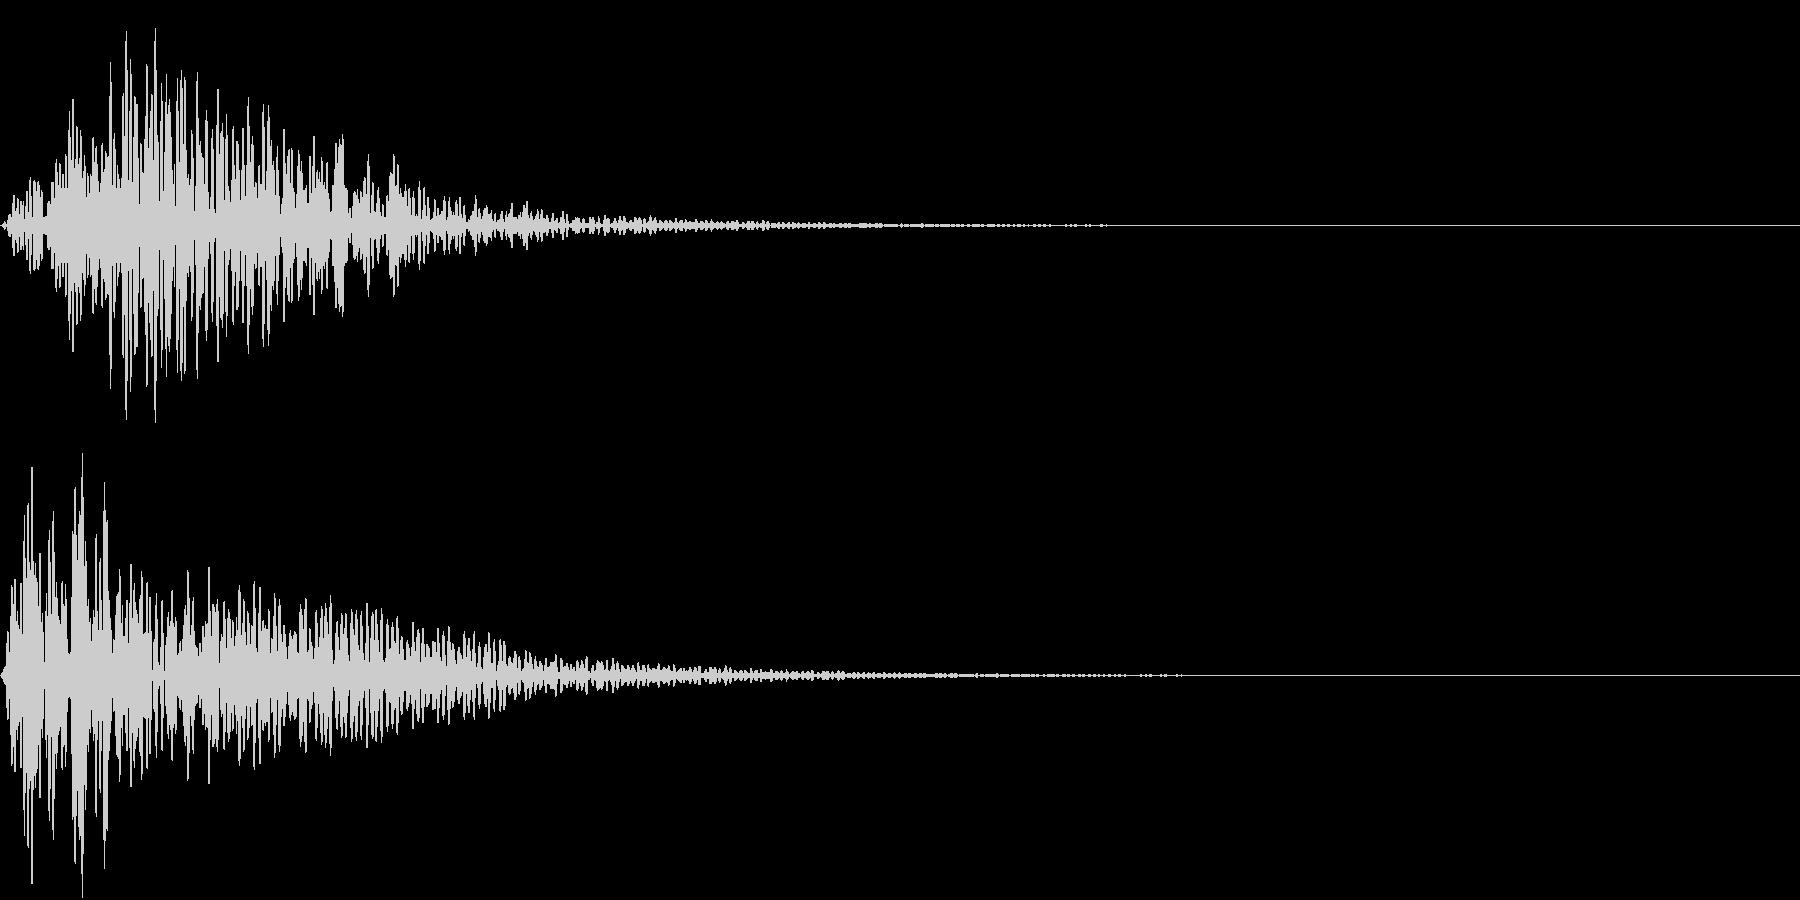 Mononoke もののけ 妖怪 鳴き声の未再生の波形